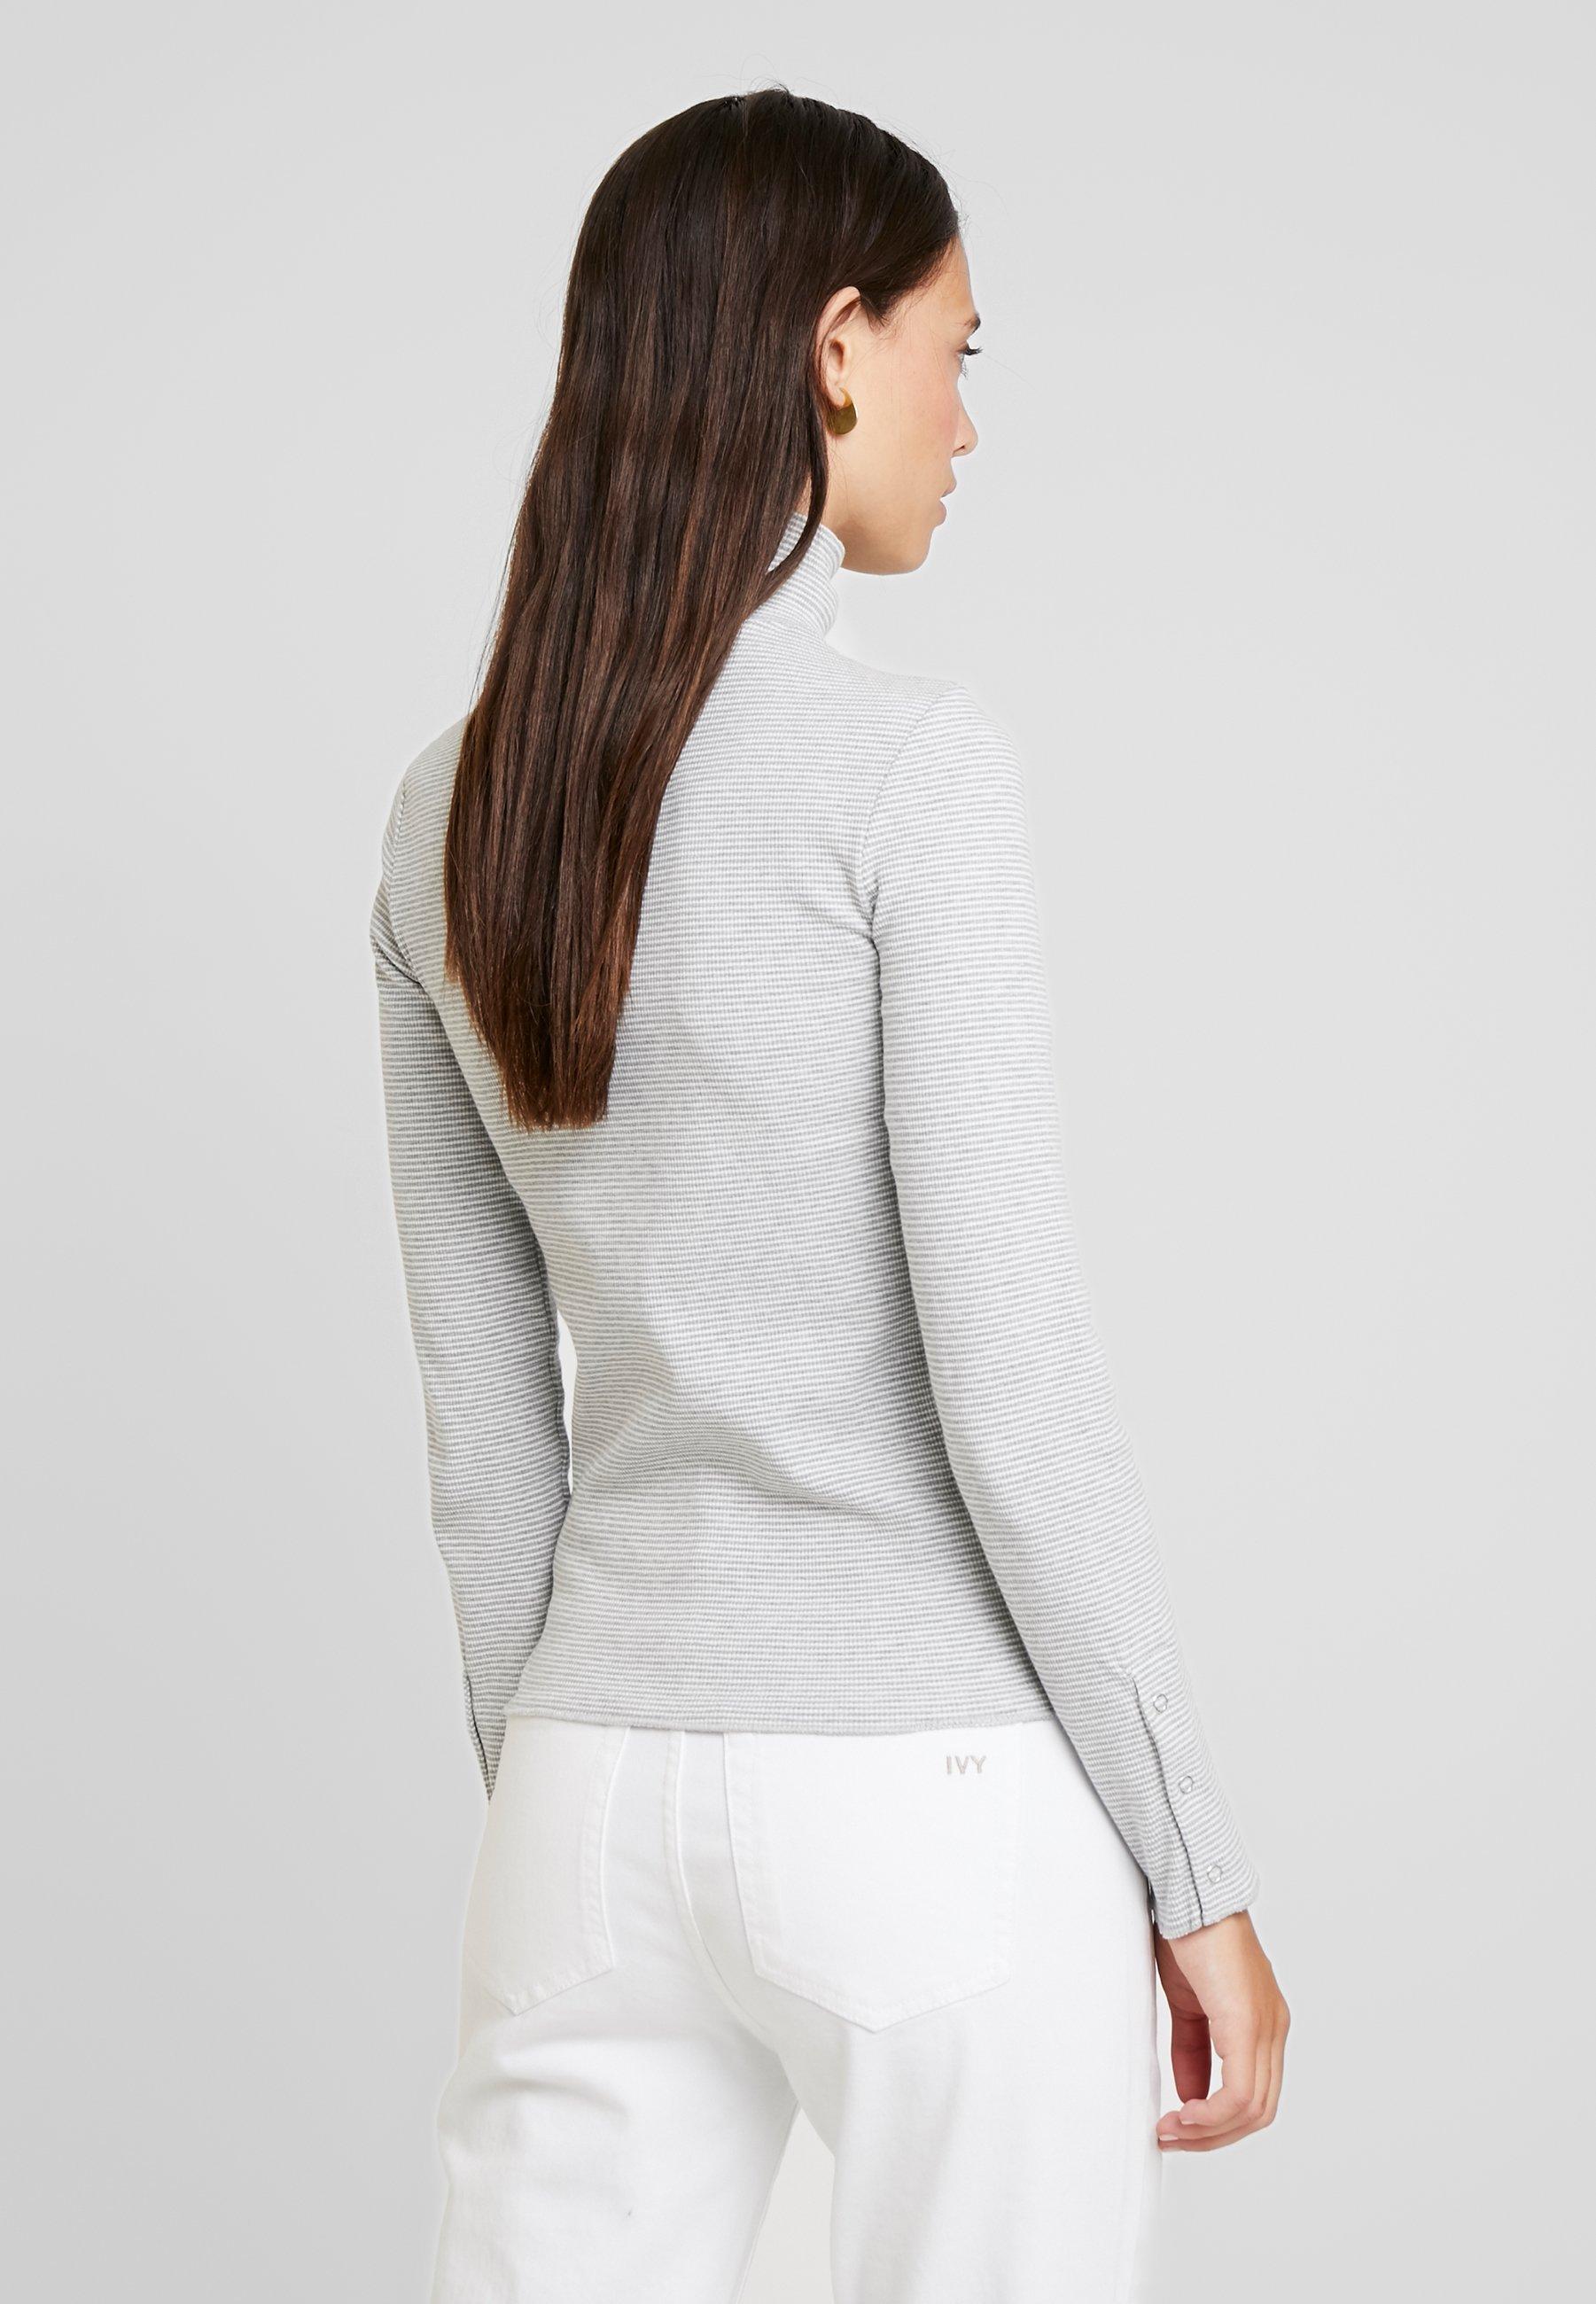 Neck Yargici white SleeveMaglione Grey Long UzqVpSM